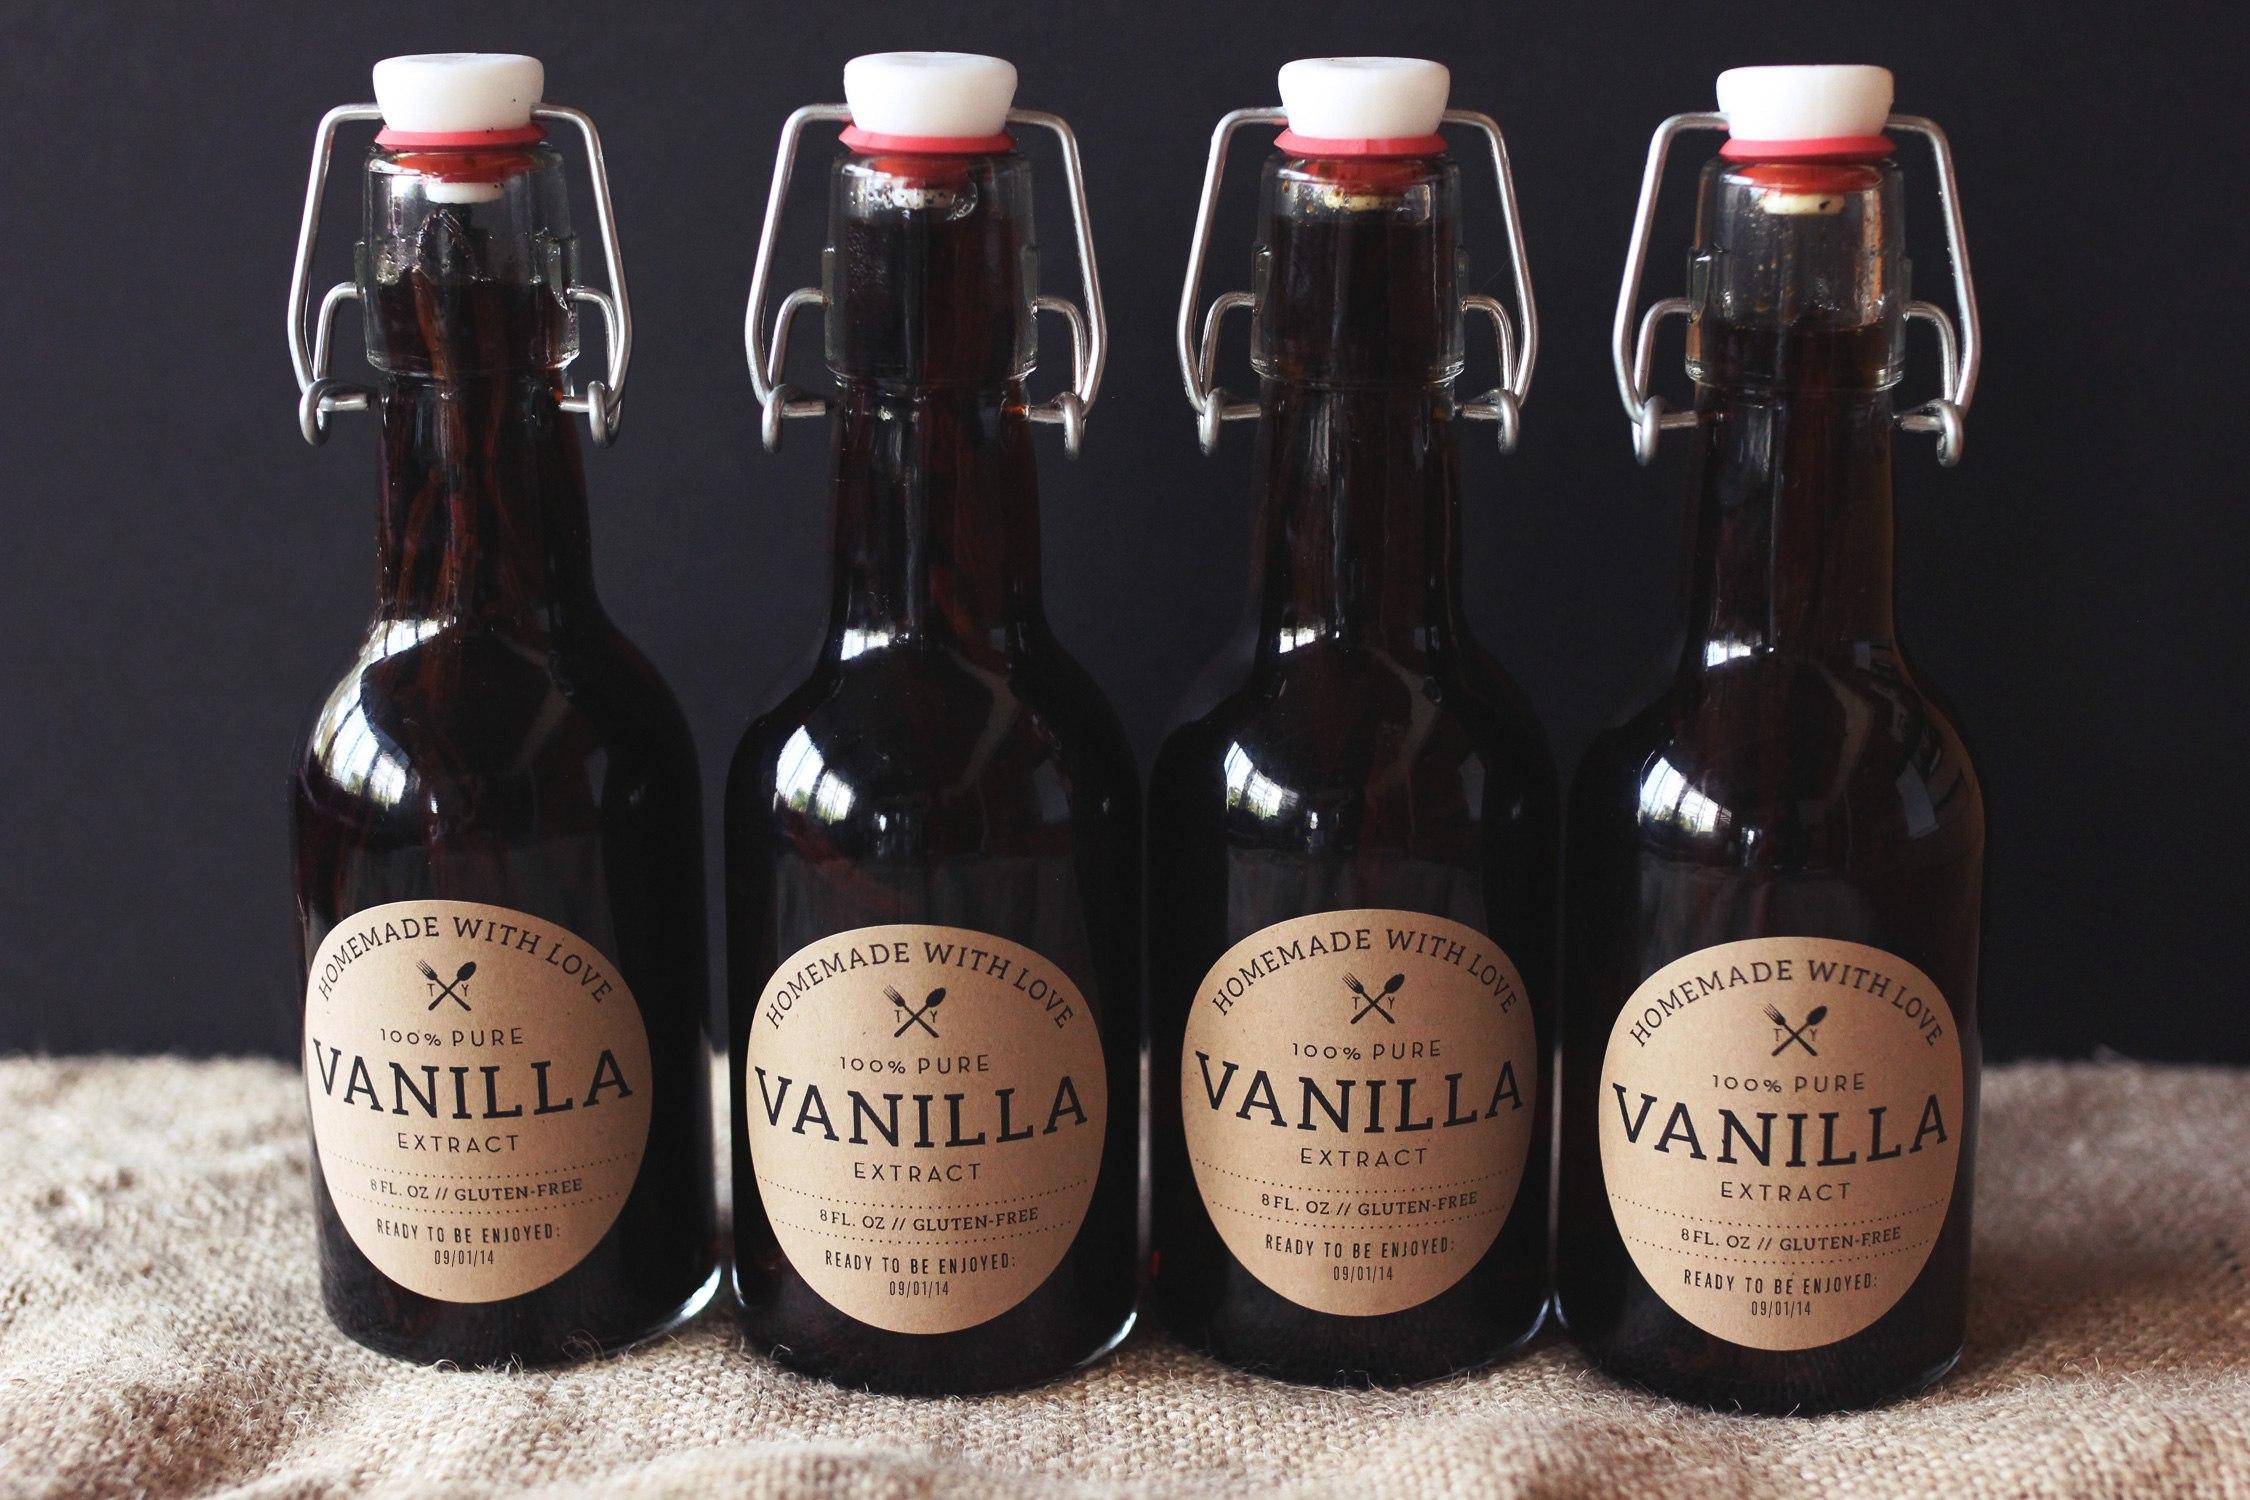 Homemade Vanilla Extract Recipe  Tasty Yummies Howto Throughout Homemade Vanilla Extract Label Template